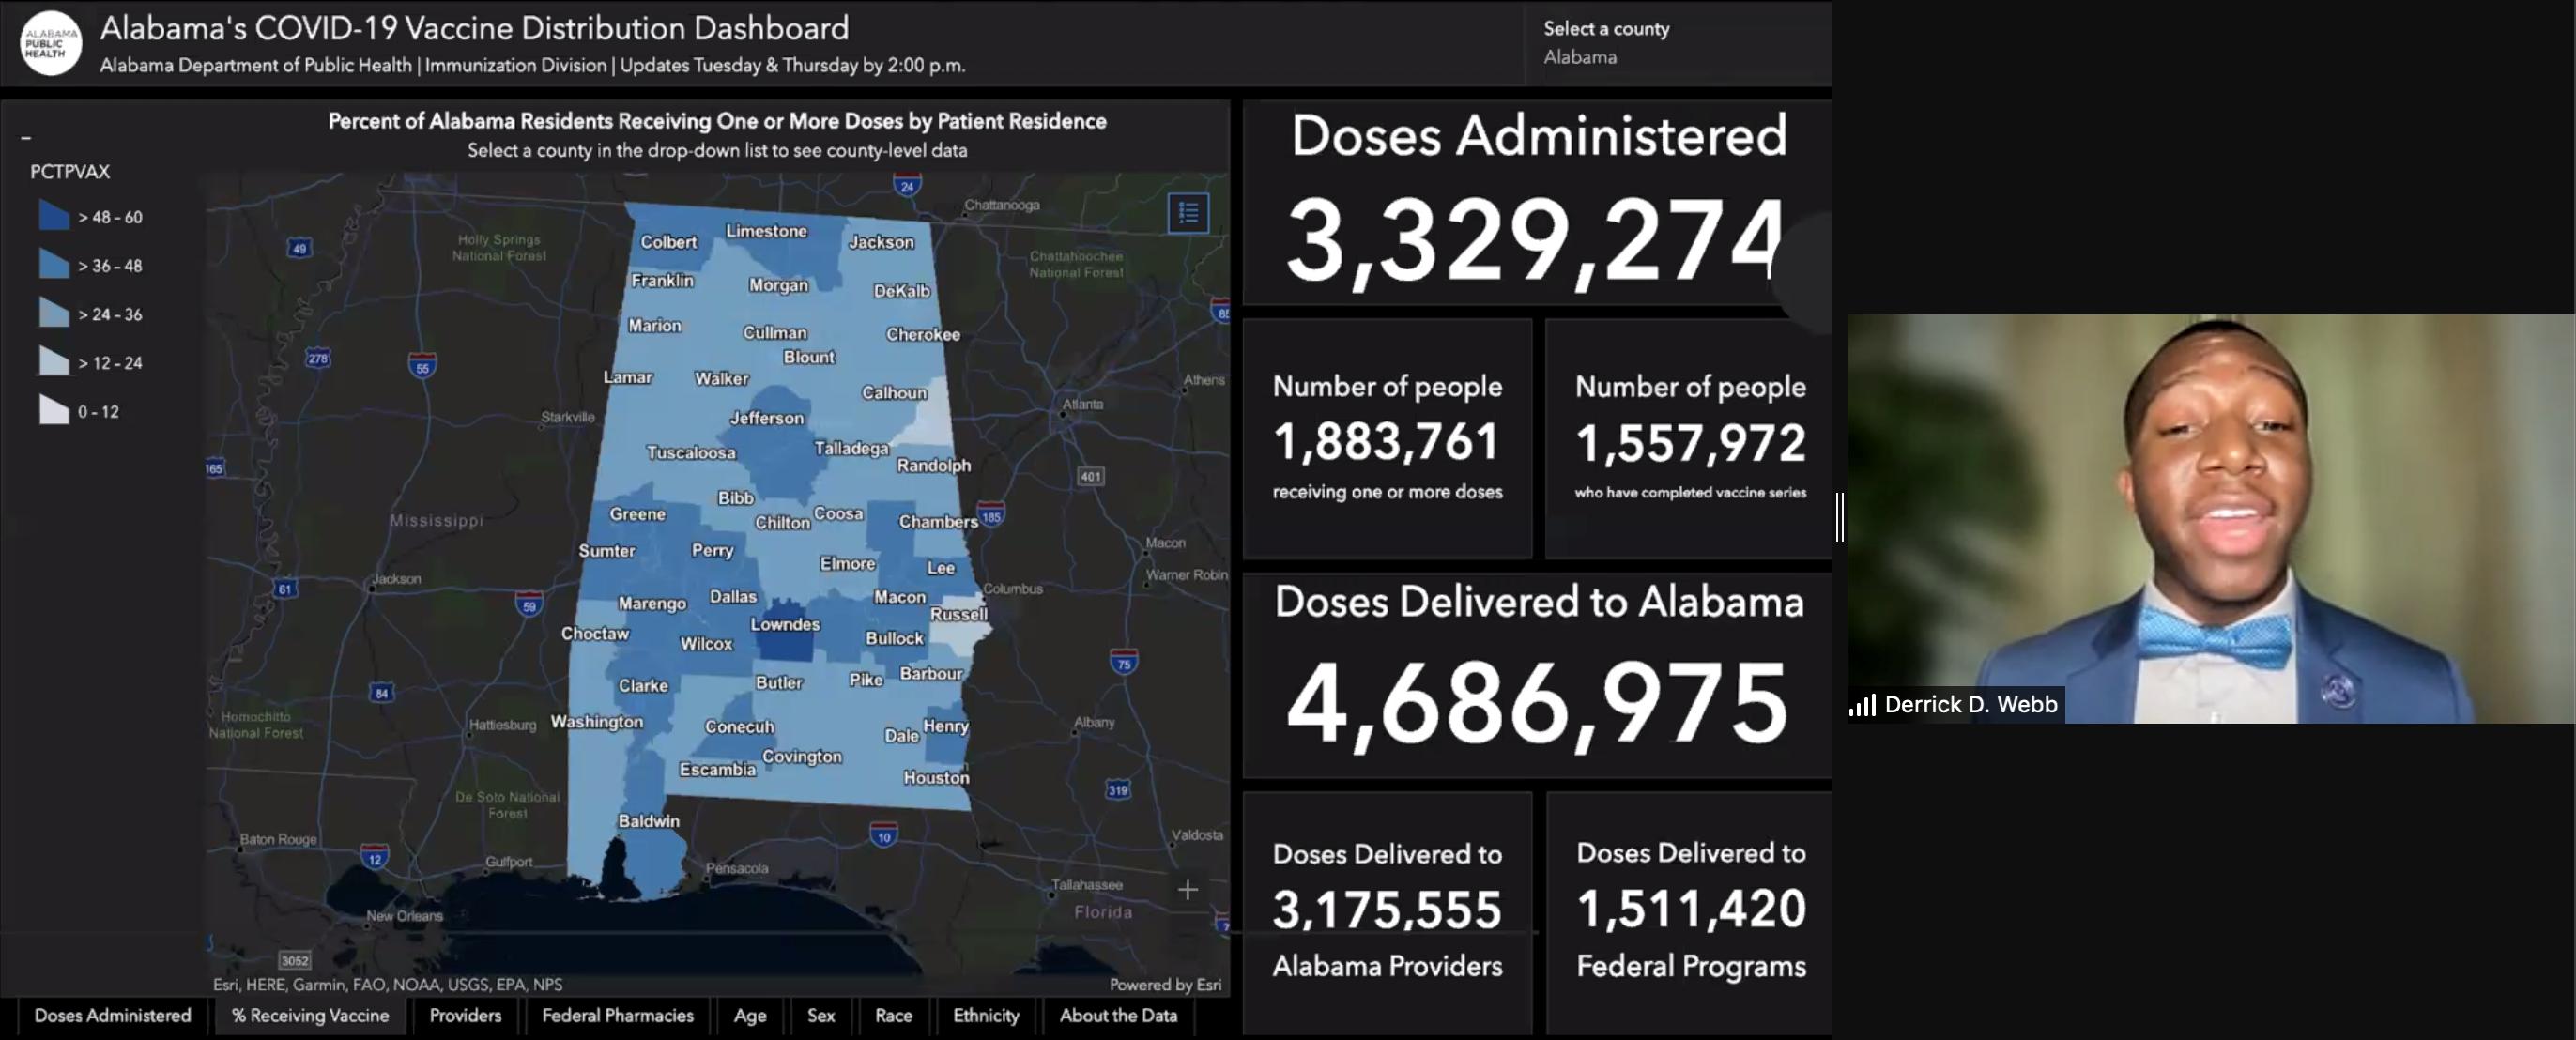 Derrick Webb Presentation Screenshot - Alabama's COVID-19 Vaccine Distribution